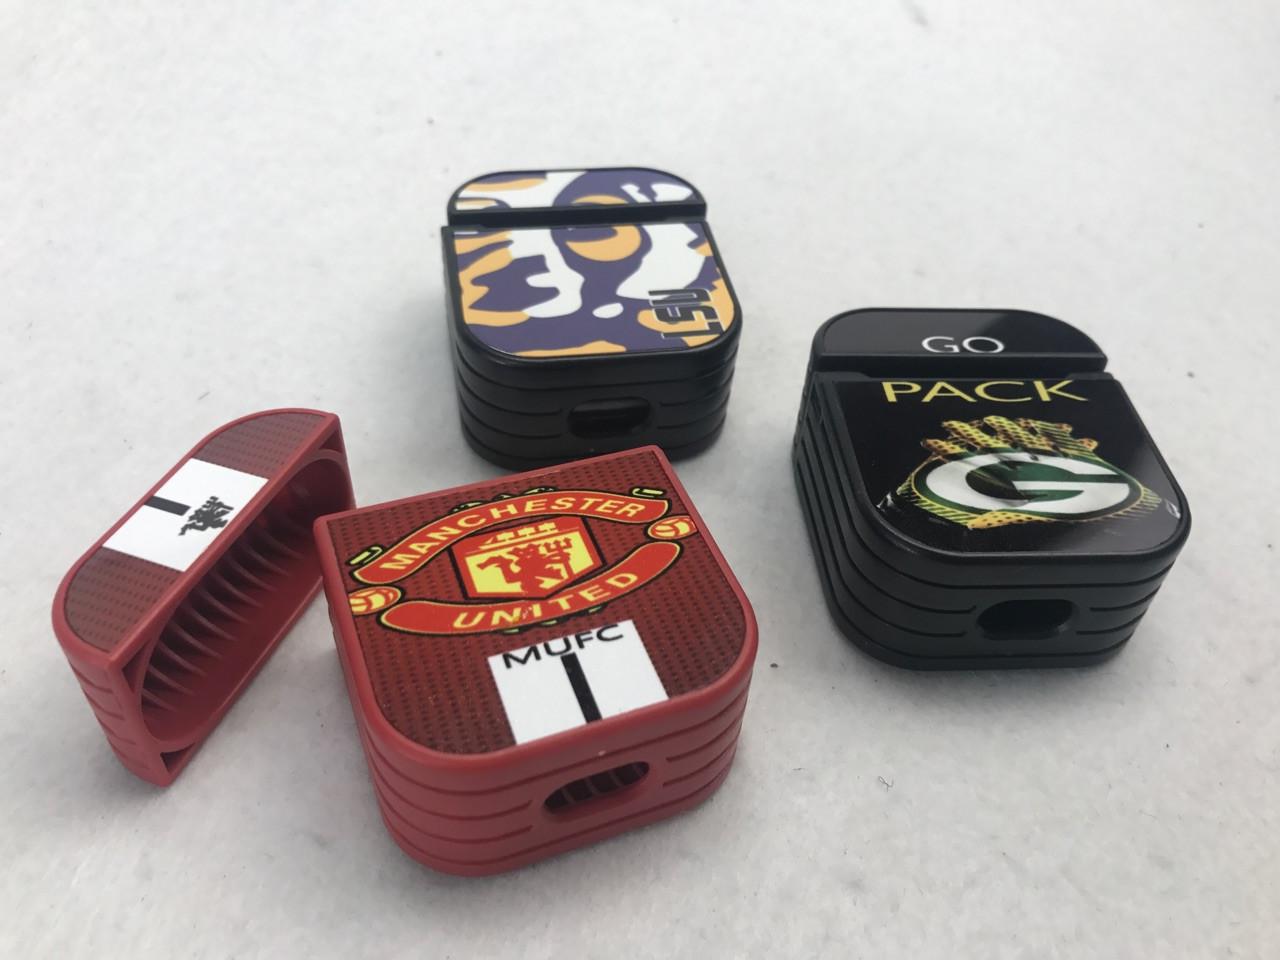 airpod bag game of thrones headphone bag airpod keychain GOT AIRPOD CASE headphone case game of thrones headphone holder earbud holder